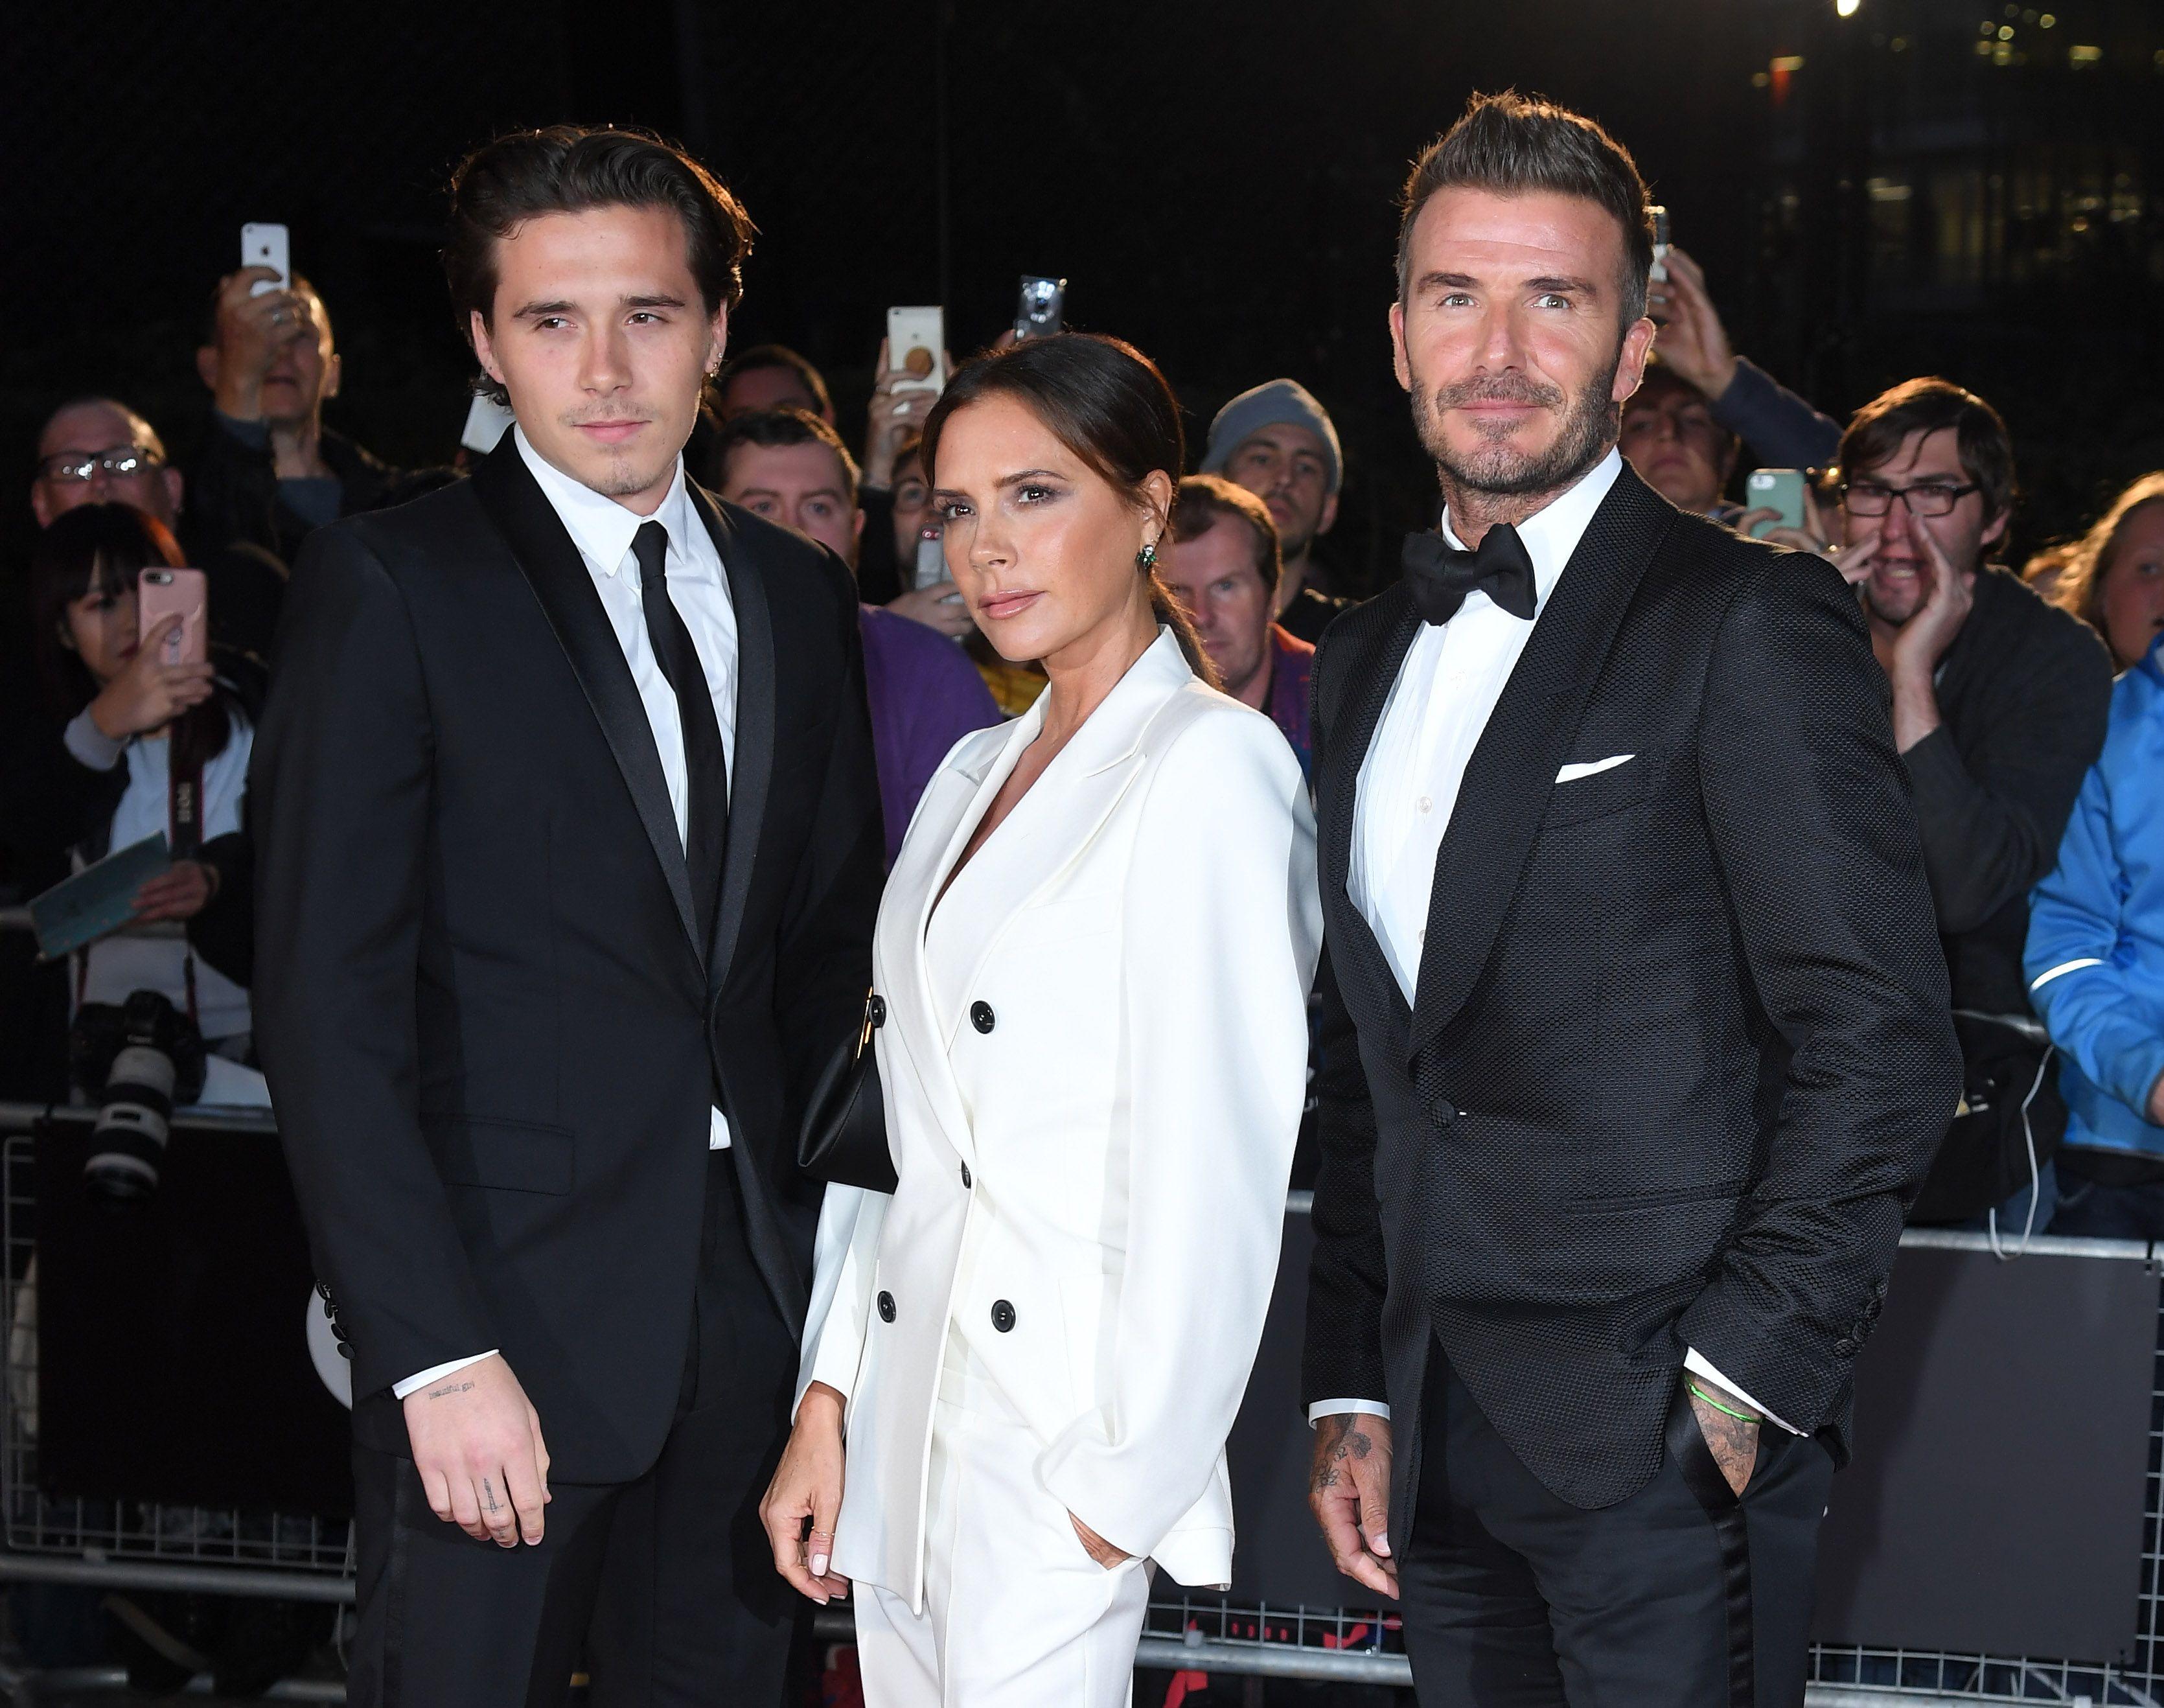 David Beckham Launches Range Of Footwear Based On Classic